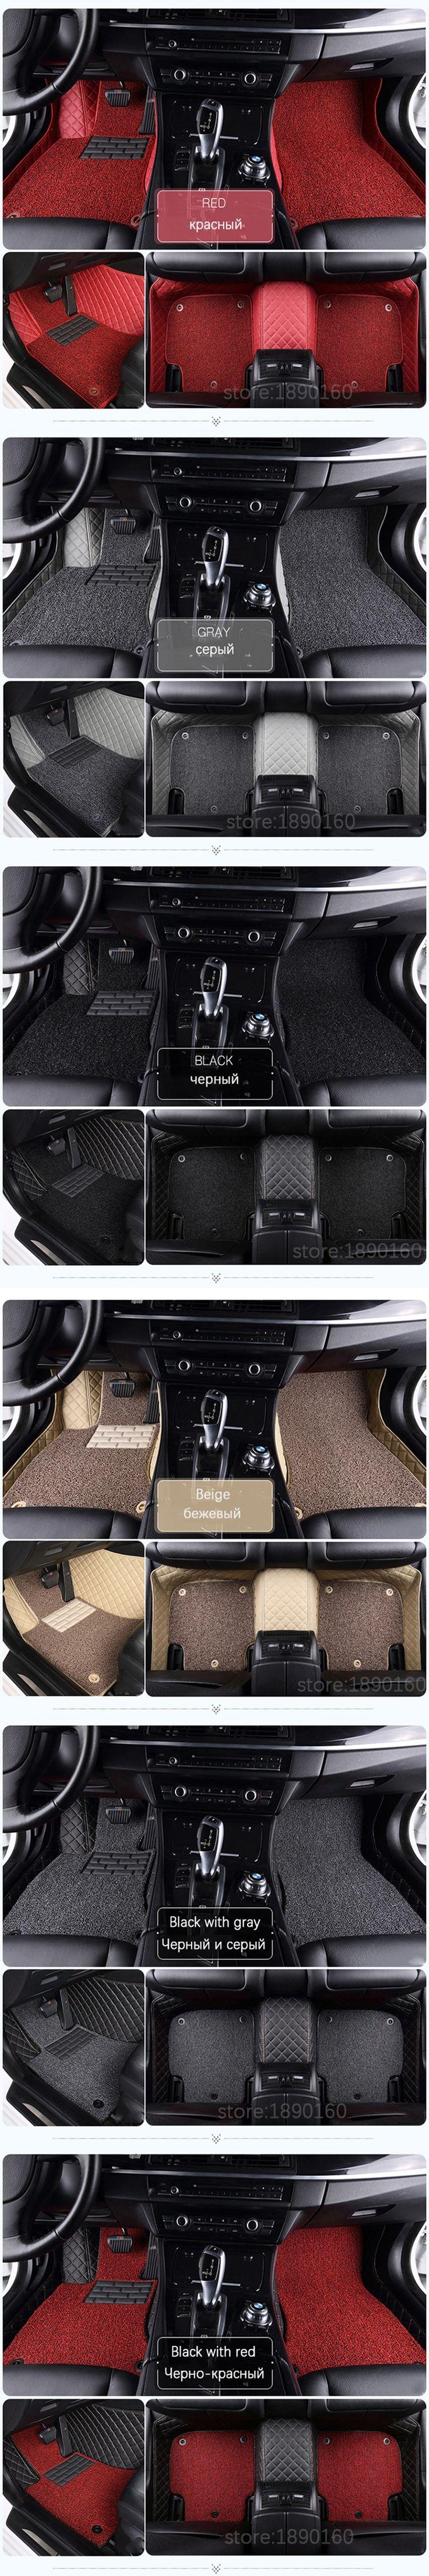 Custom car floor mats for Toyota All Models Corolla Camry Rav4 Auris Prius Yalis Avensis 2014 accessories car styling floor mat